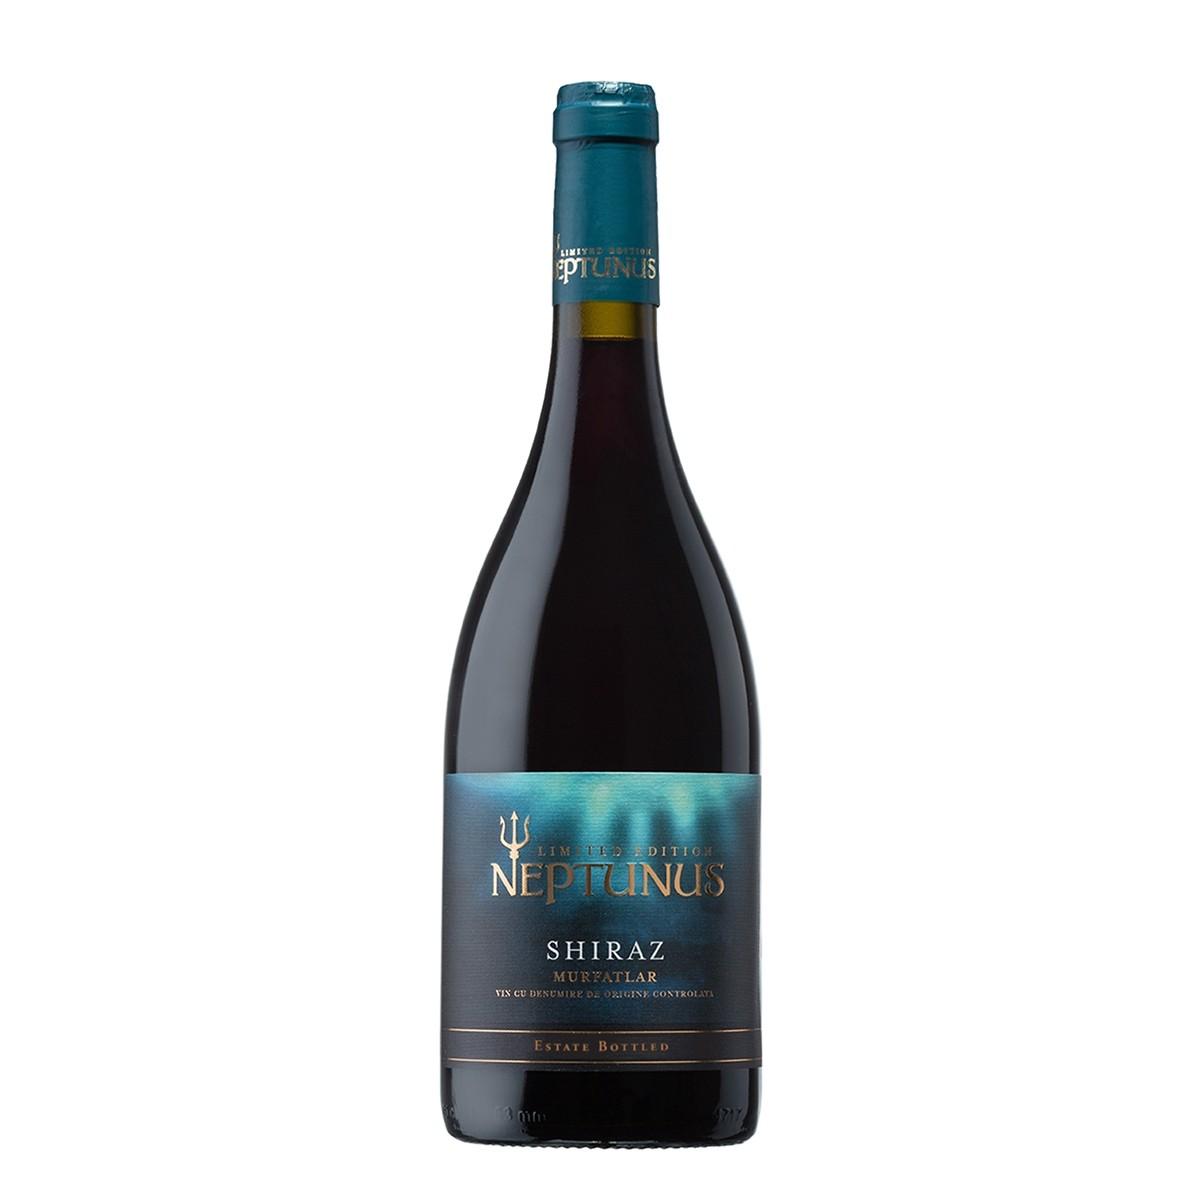 Neptunus Shiraz 2016